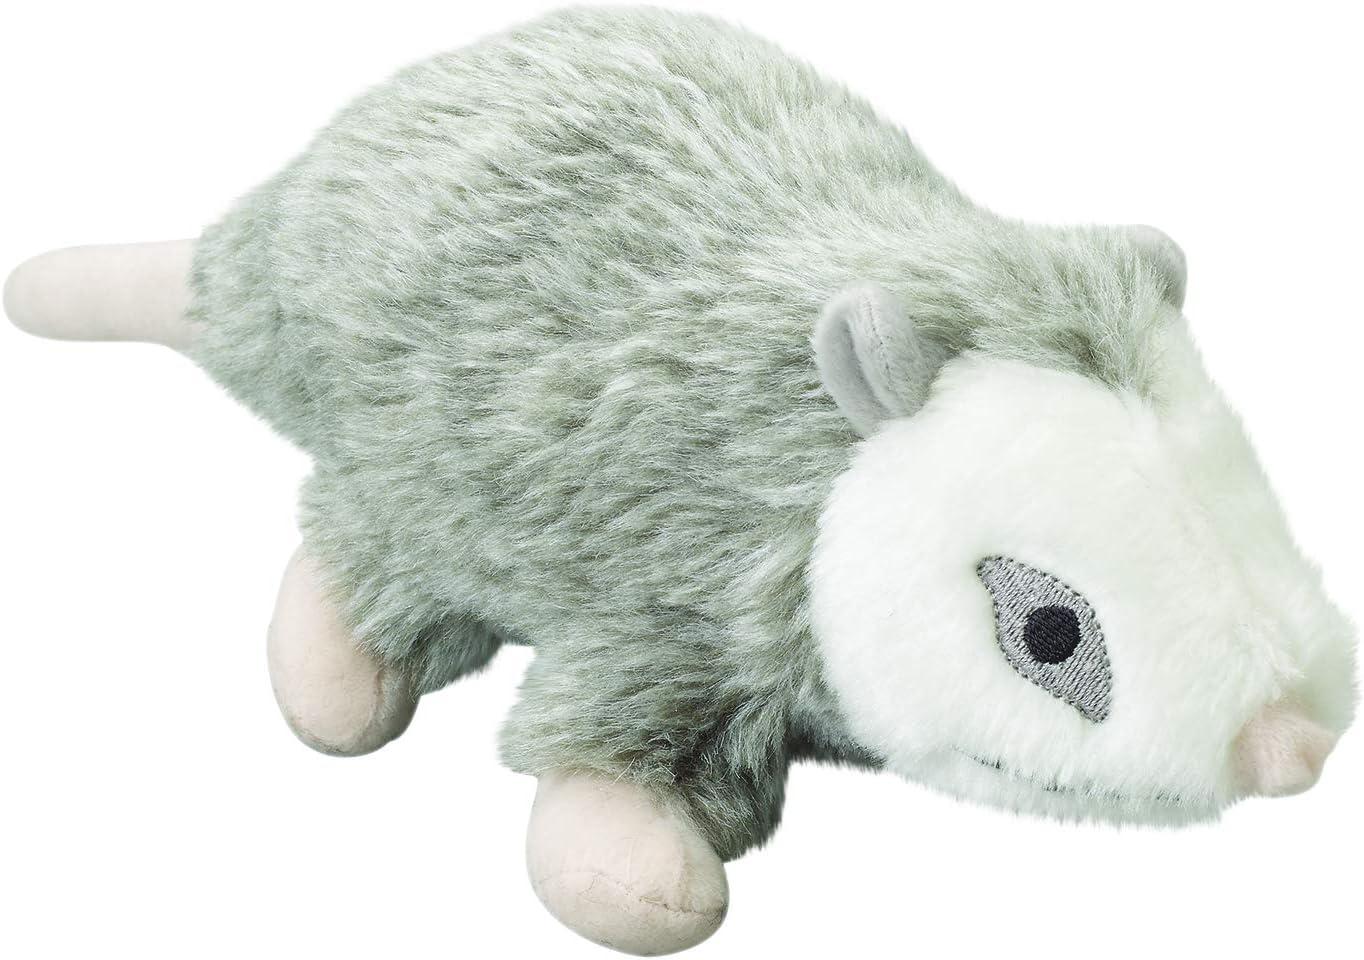 SPOT Woodland Collection Possum   Dog Squeak Toys   Grunt Toy   Puppy Toys   Plush Fabric   15